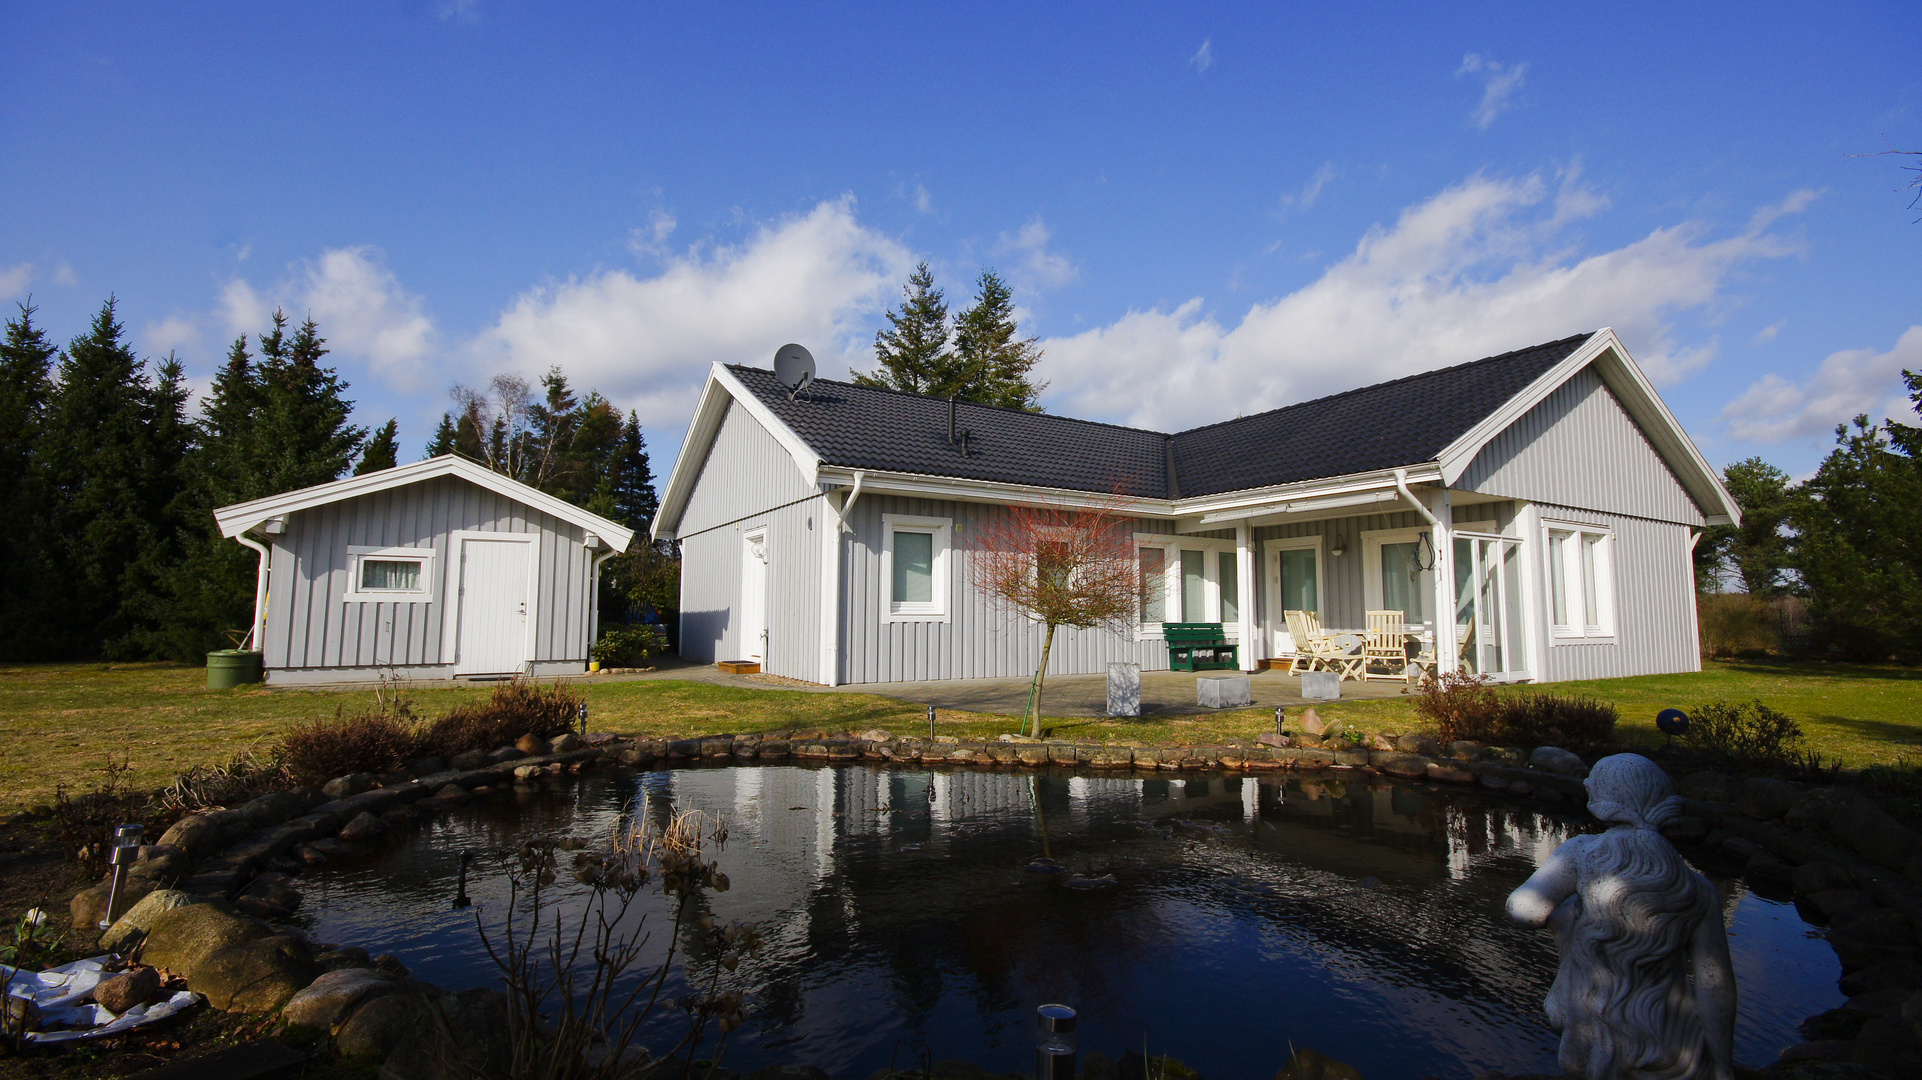 Wunderschönes Sommerhaus